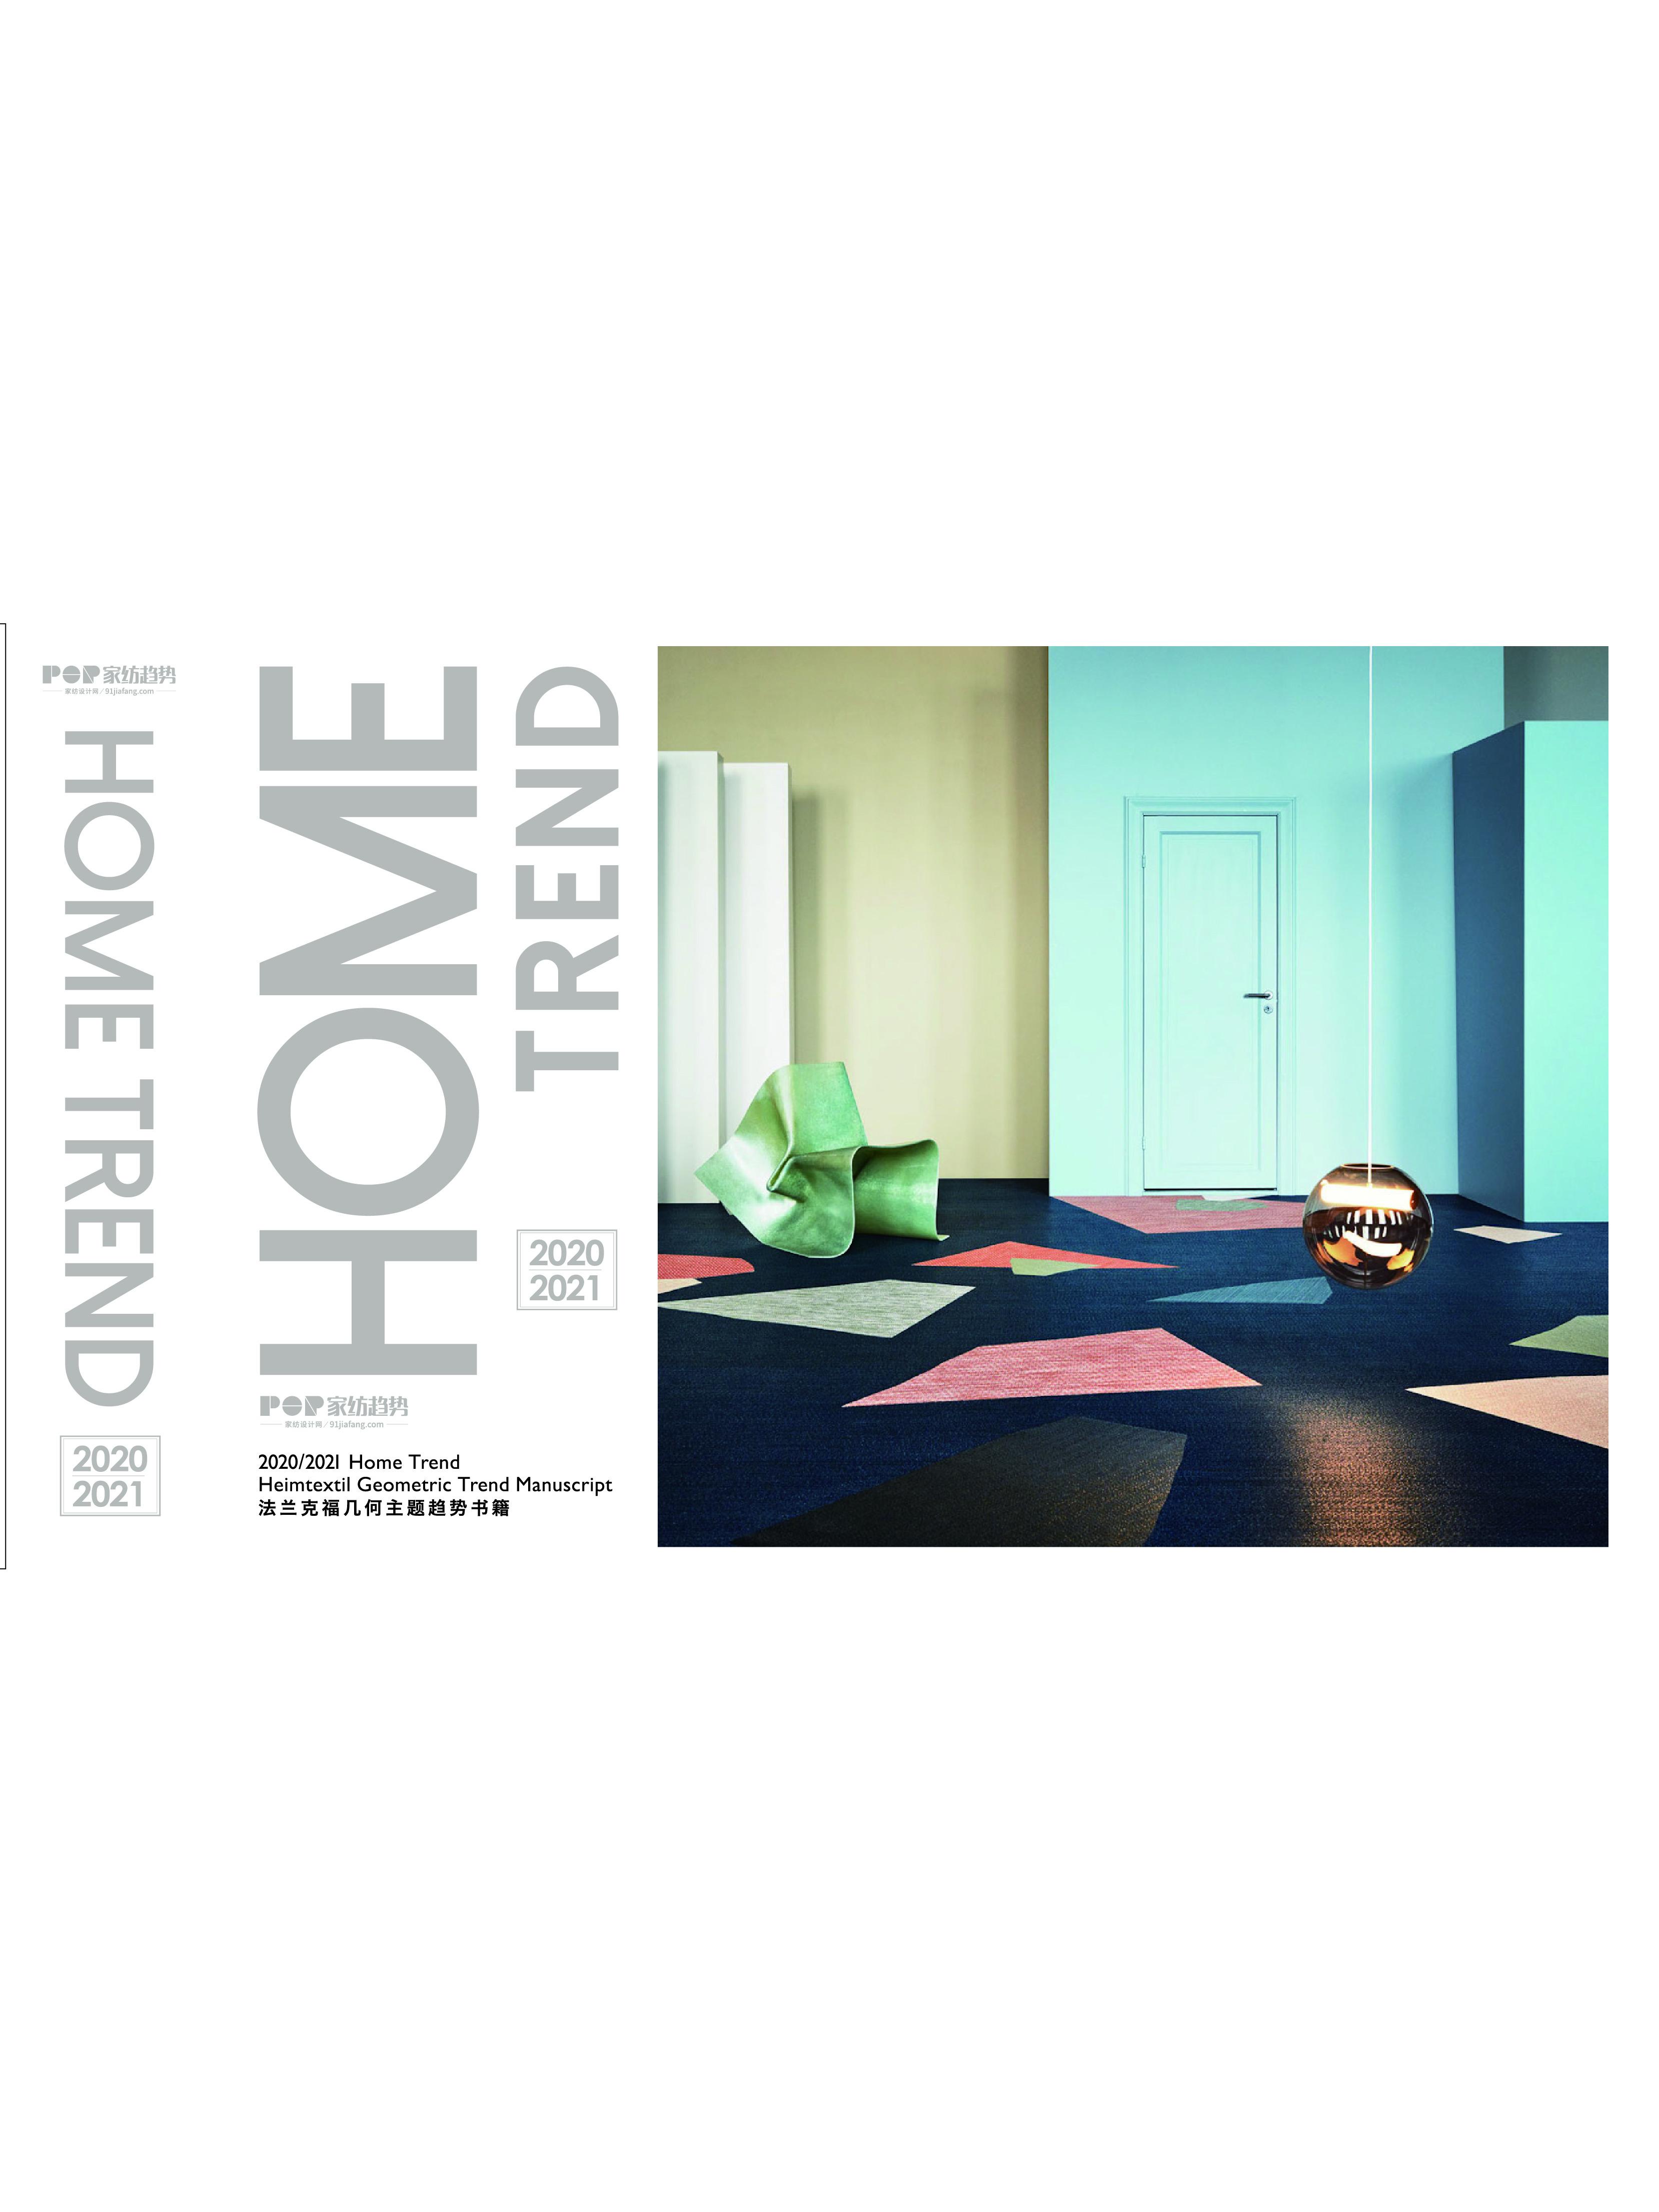 《HOME TREND》2020-2021法兰克福几何主题趋势书籍(一)